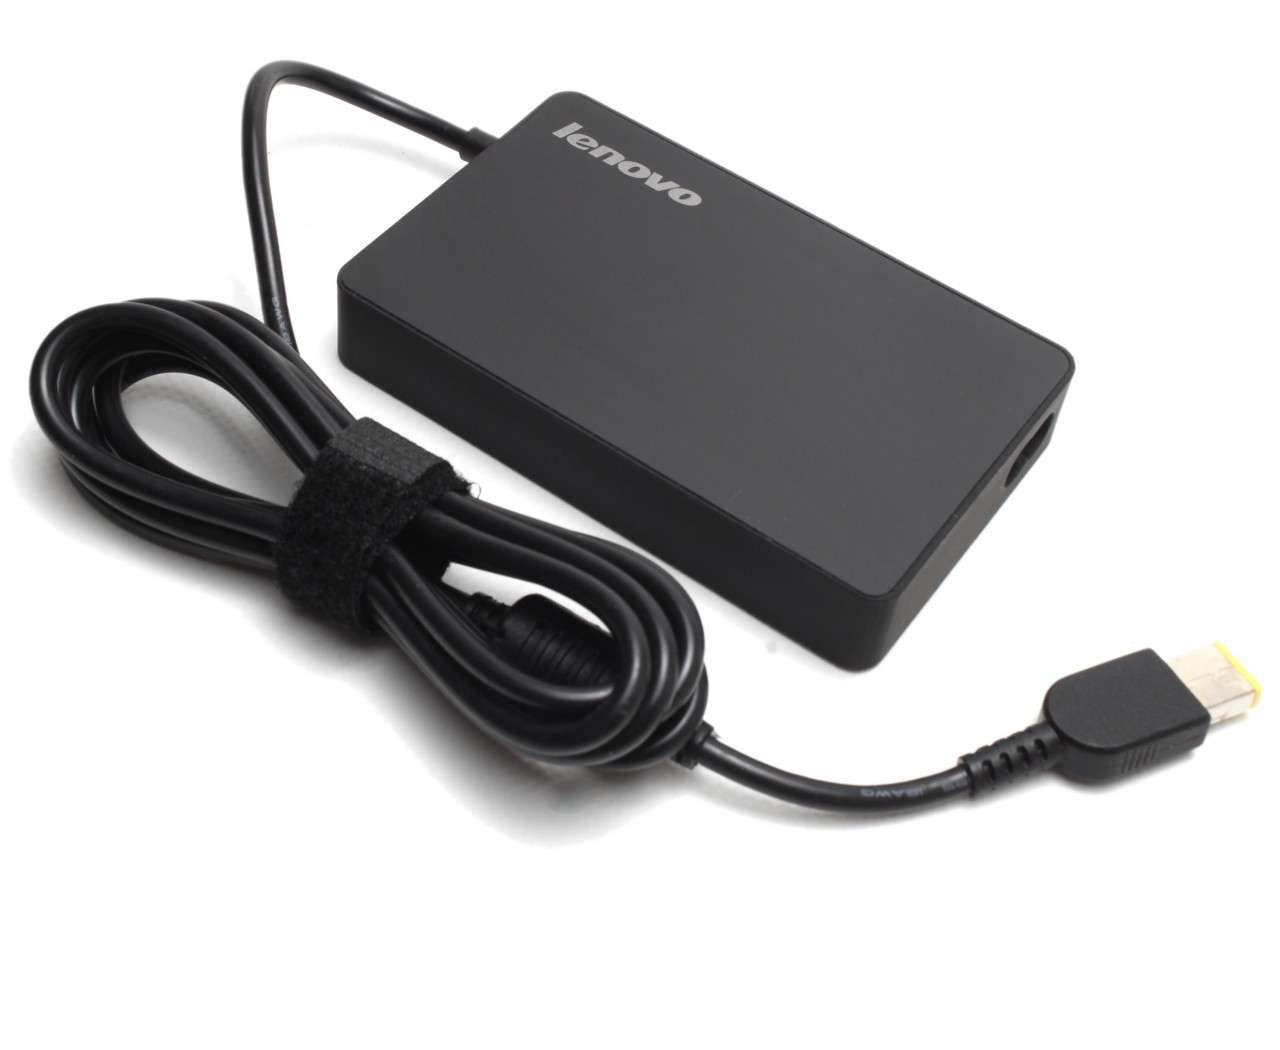 Incarcator Lenovo ThinkPad S431 20BA 65W Slim Version imagine